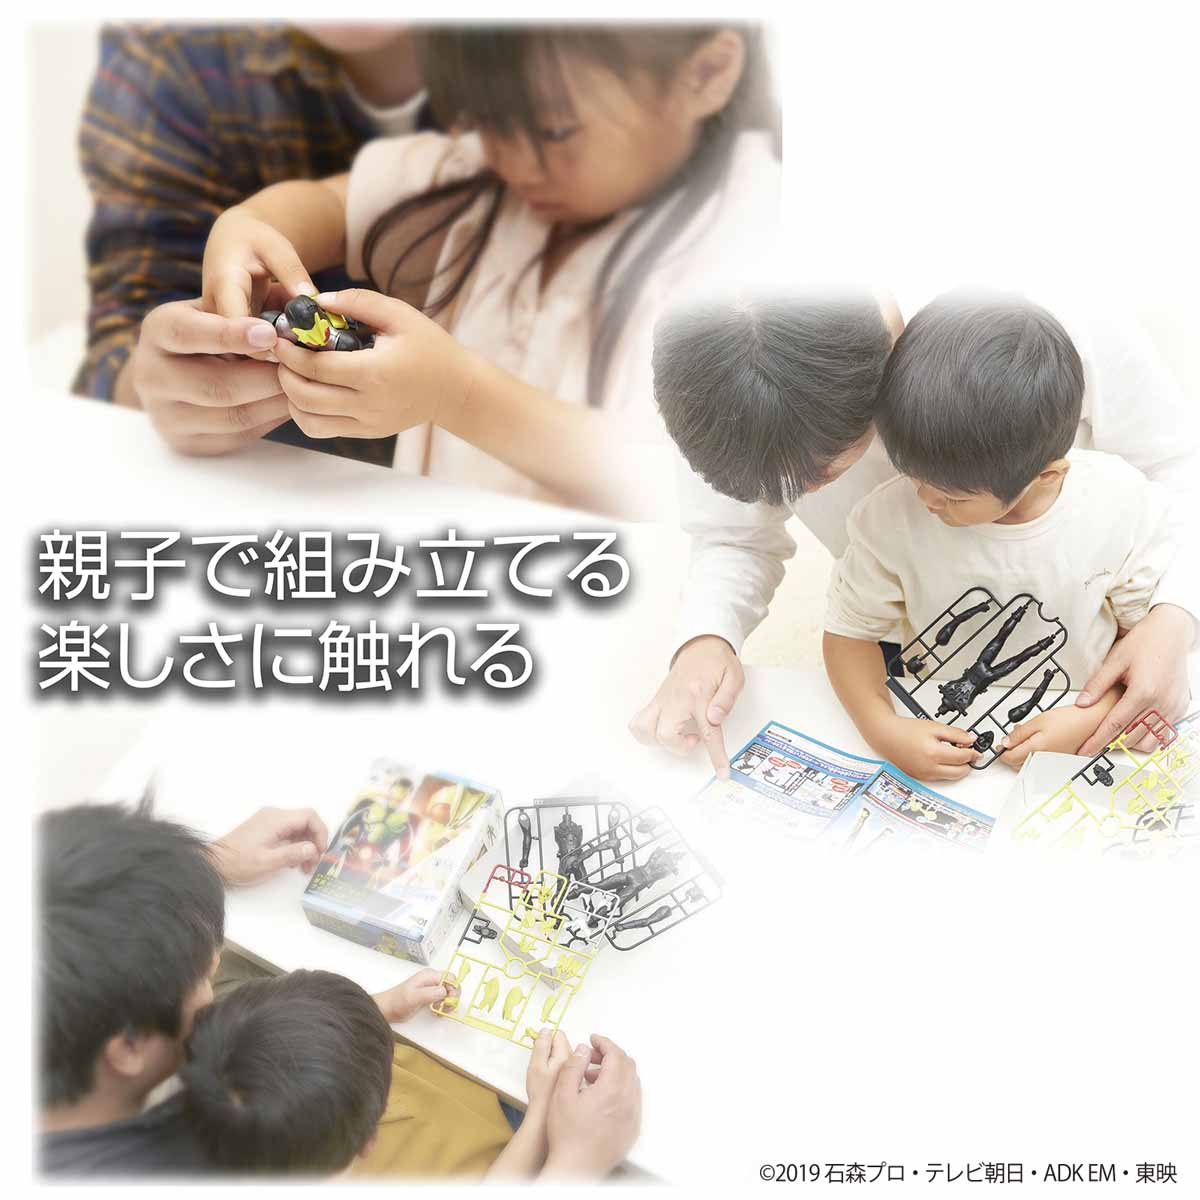 ENTRY GRADE『仮面ライダーゼロワン ライジングホッパー』プラモデル-003